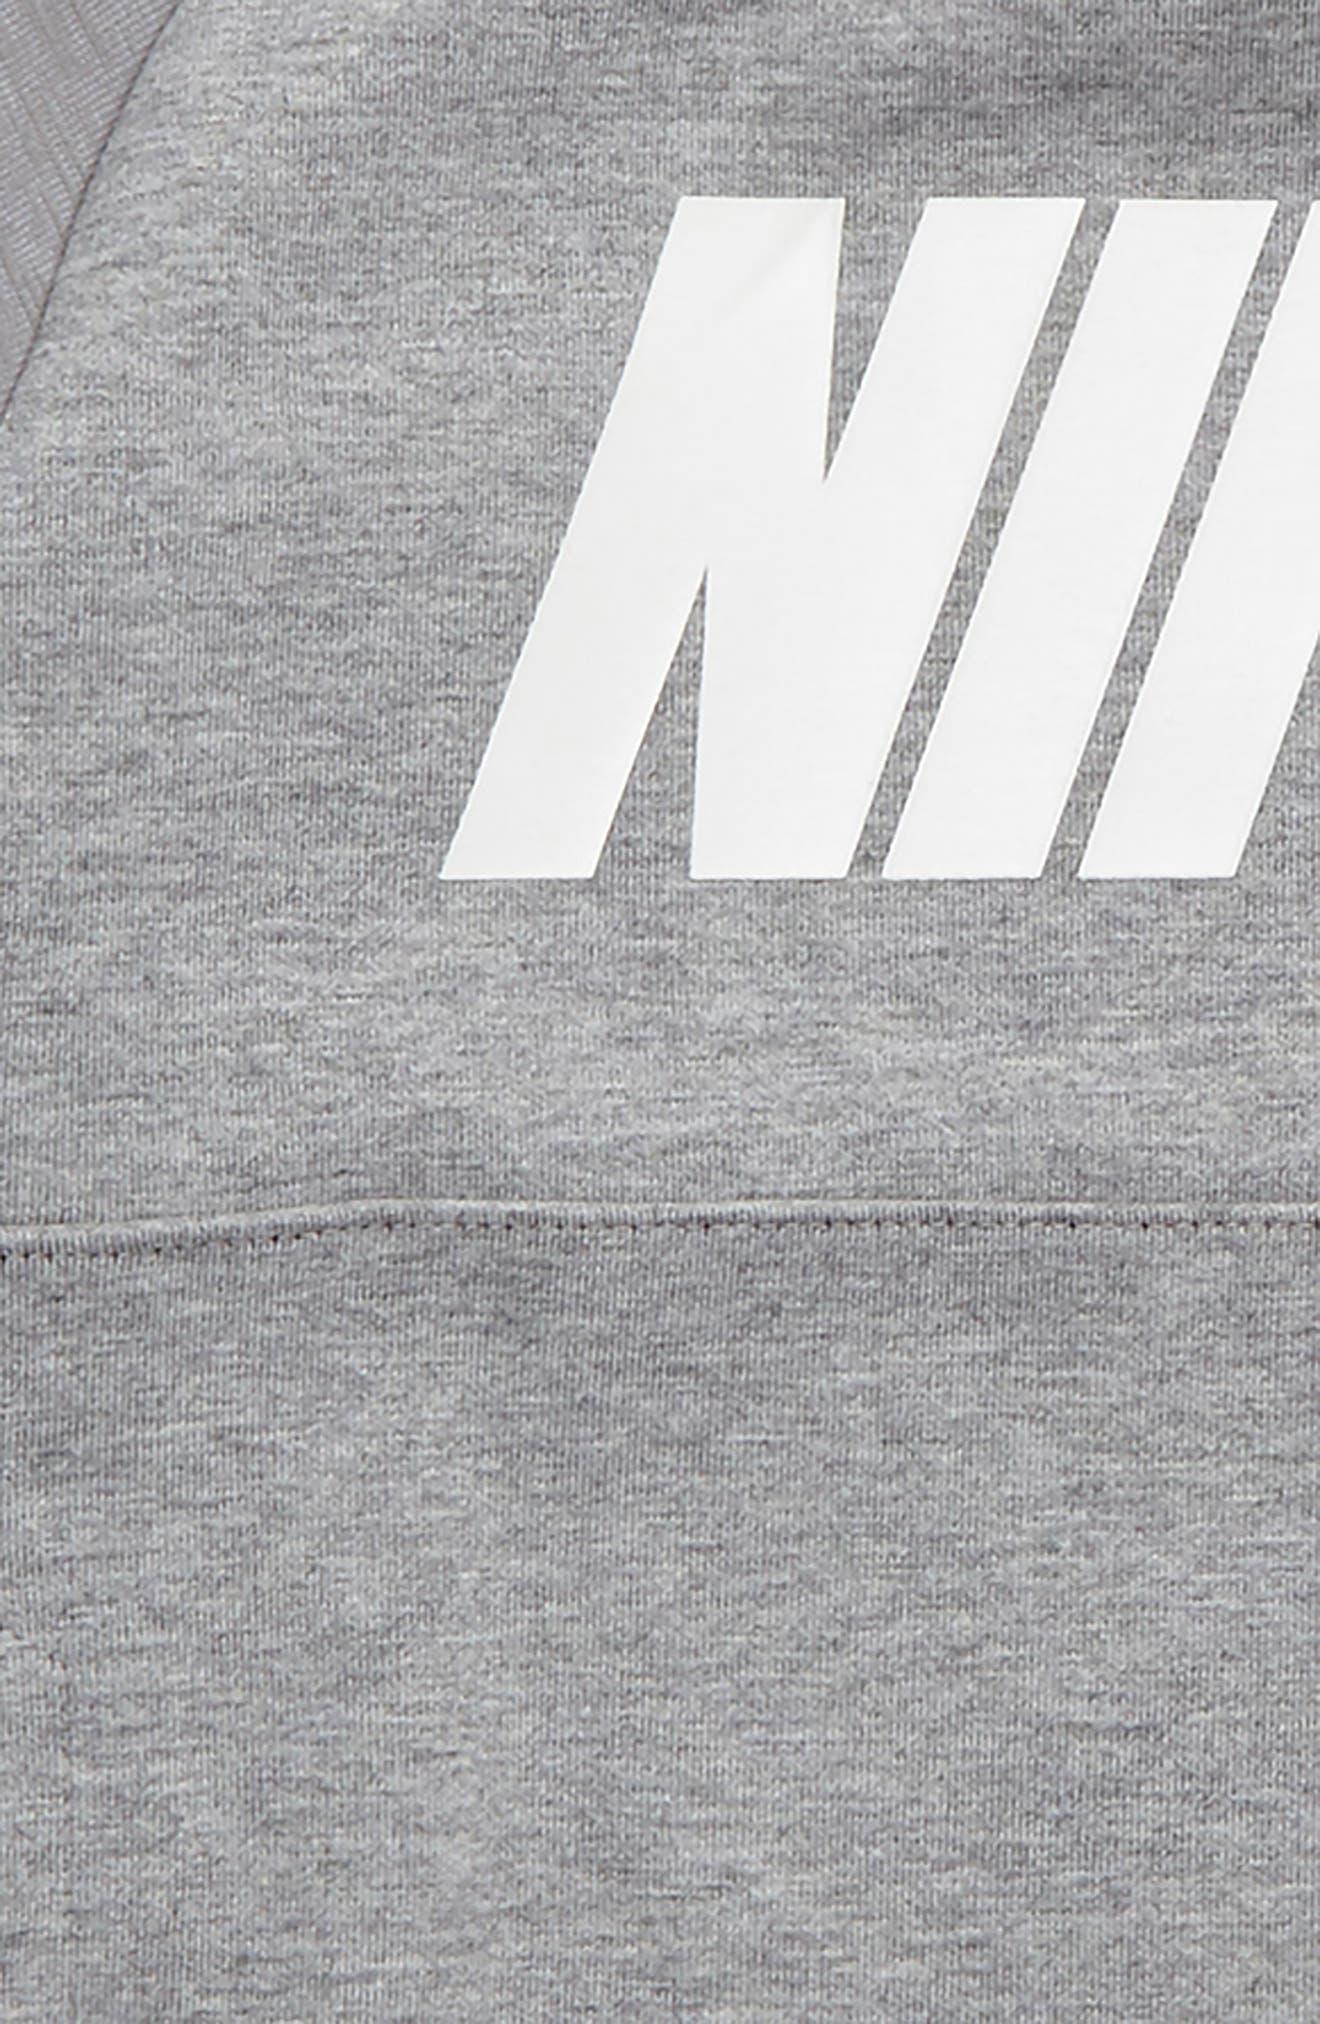 Alternate Image 2  - Nike Raglan Sleeve Sweatshirt (Toddler Boys & Little Boys)